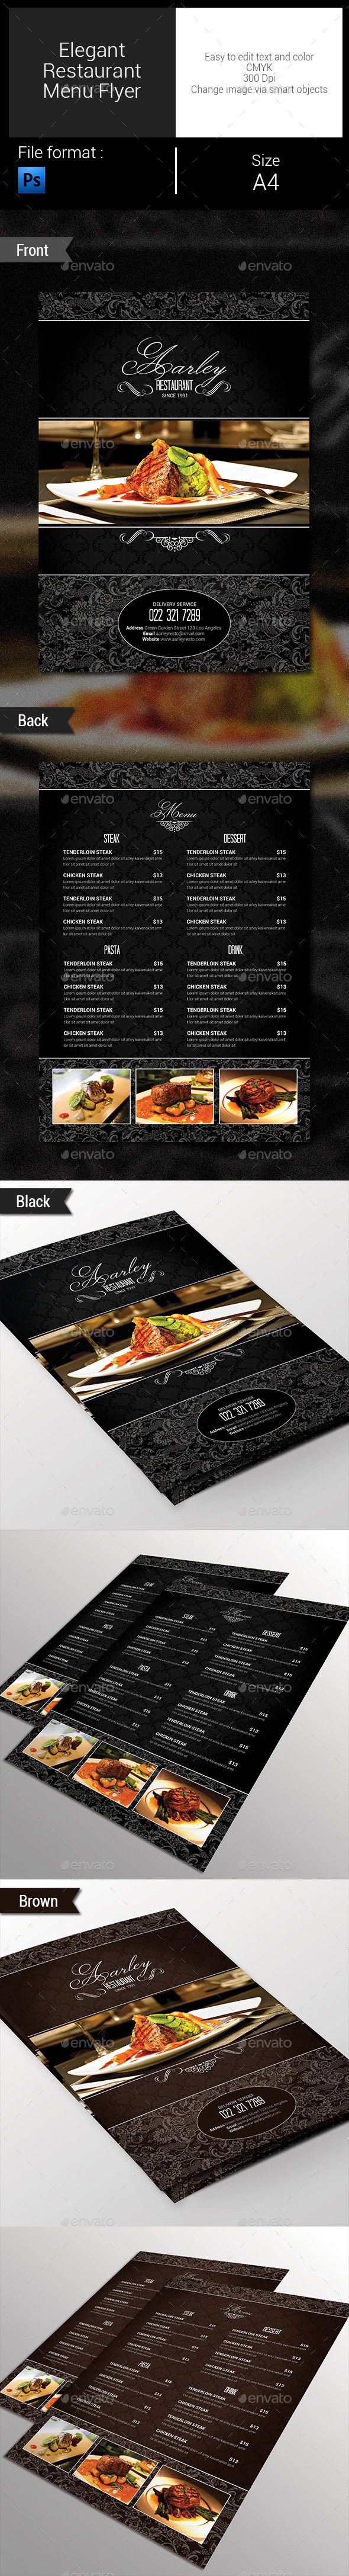 Elegant Restaurant Menu Flyer - Food Menus Print Templates